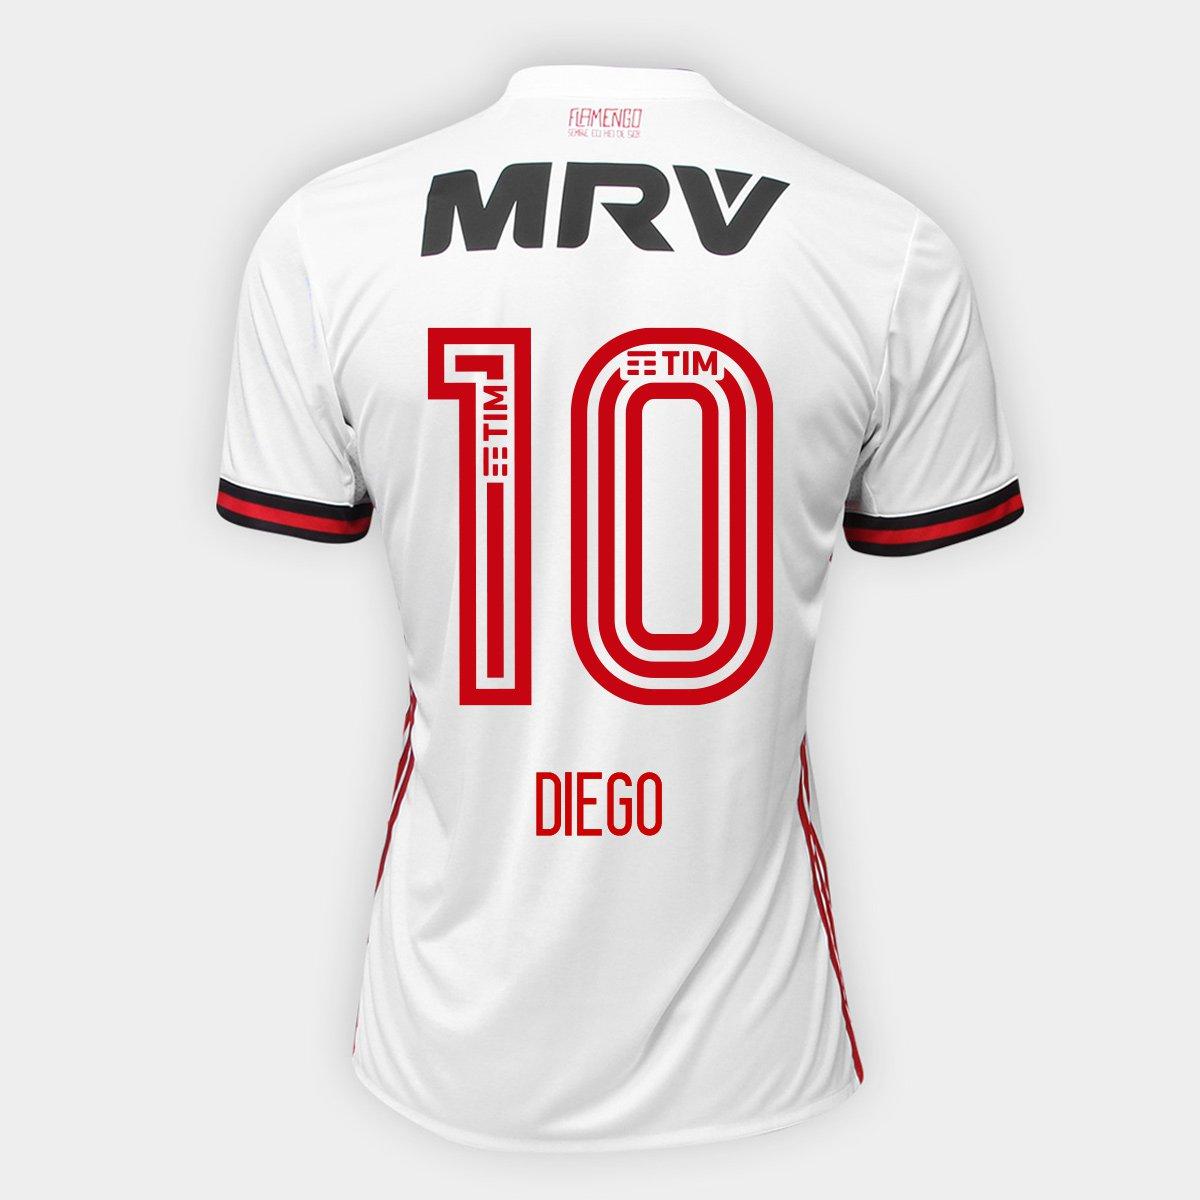 7c063618f65706 Camisa Flamengo II 17/18 N° 10 - Diego Torcedor Adidas Masculina | Netshoes